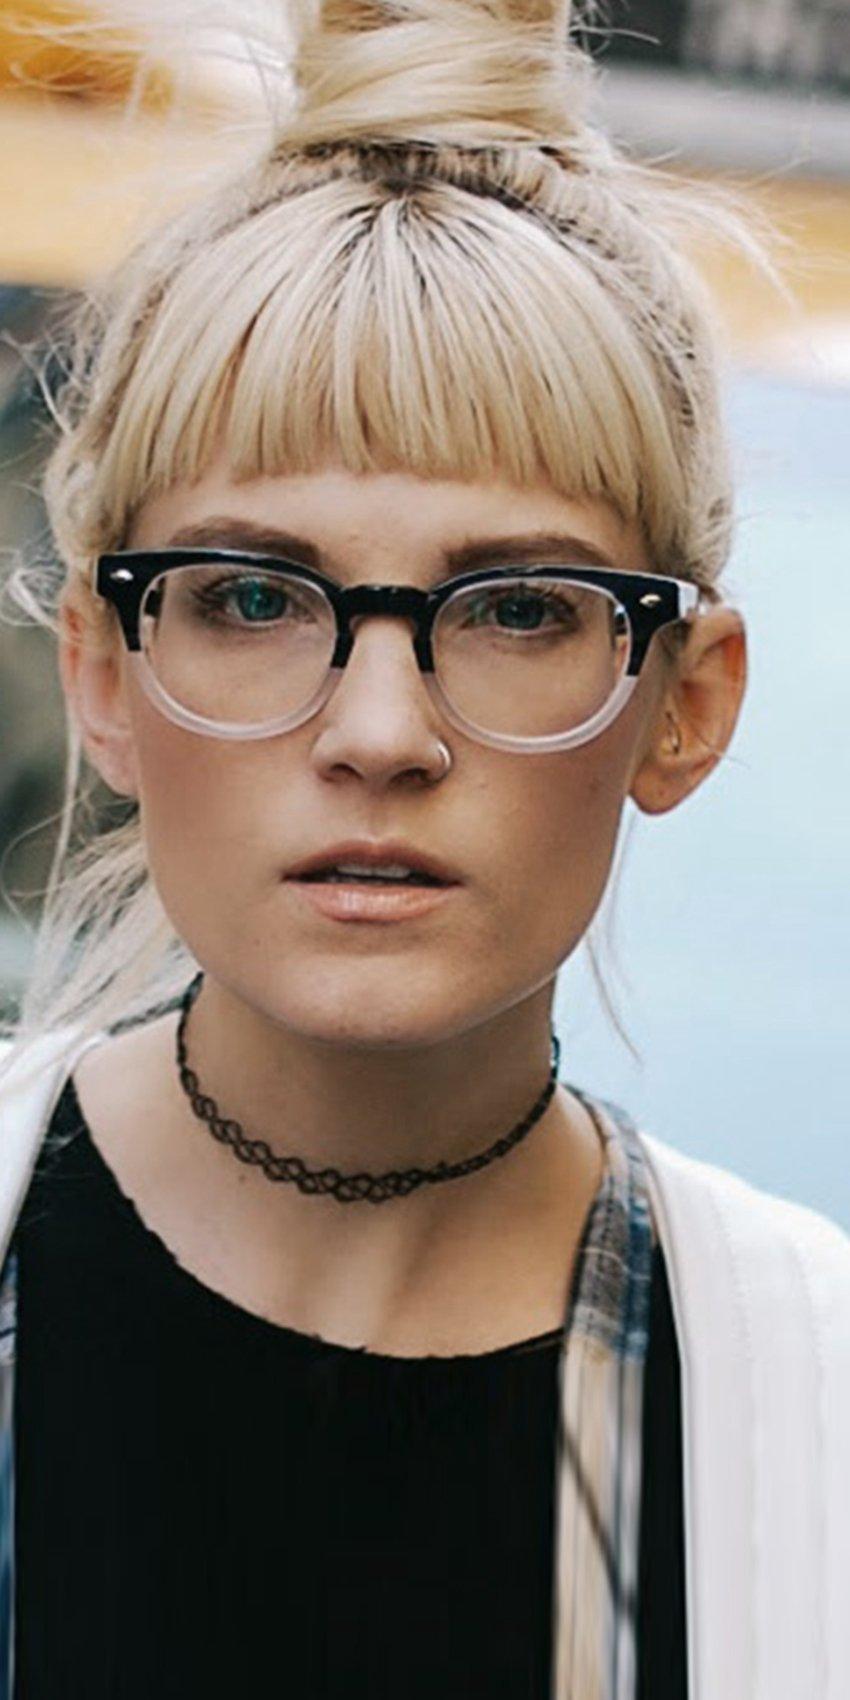 Young woman wearing Zenni glasses